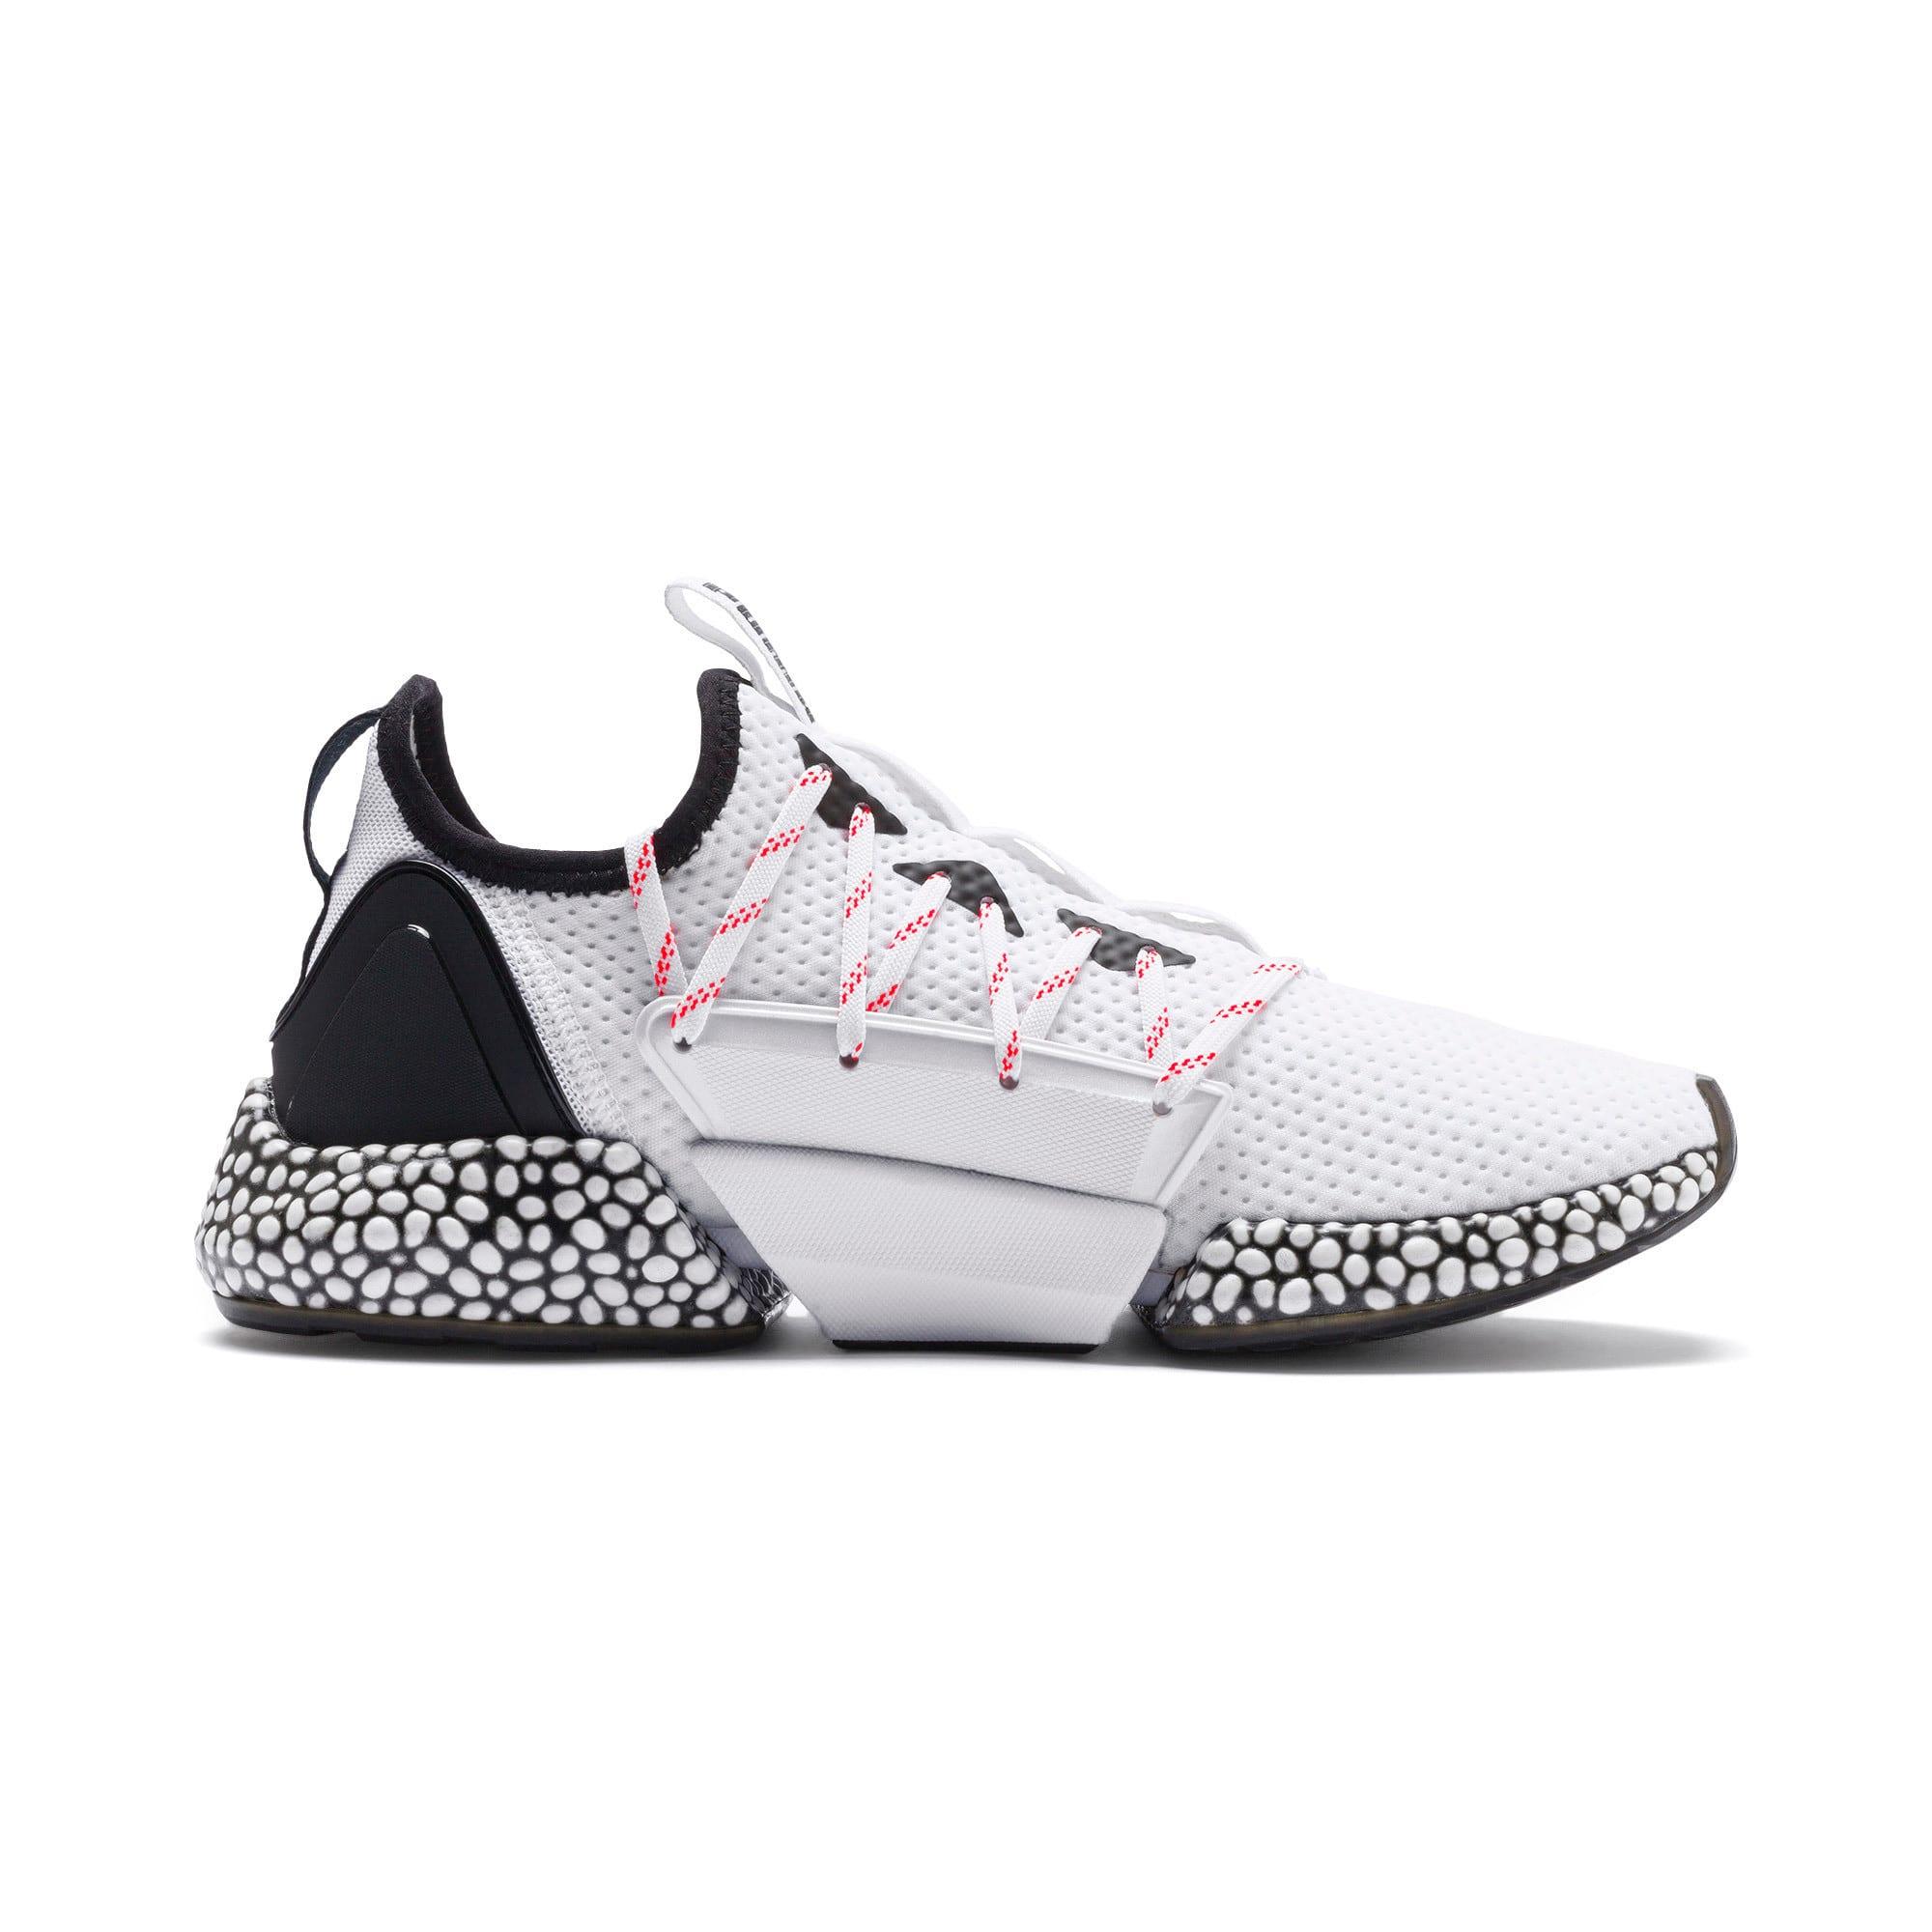 Thumbnail 6 of HYBRID Rocket Aero Men's Running Shoes, Puma White-Puma Black, medium